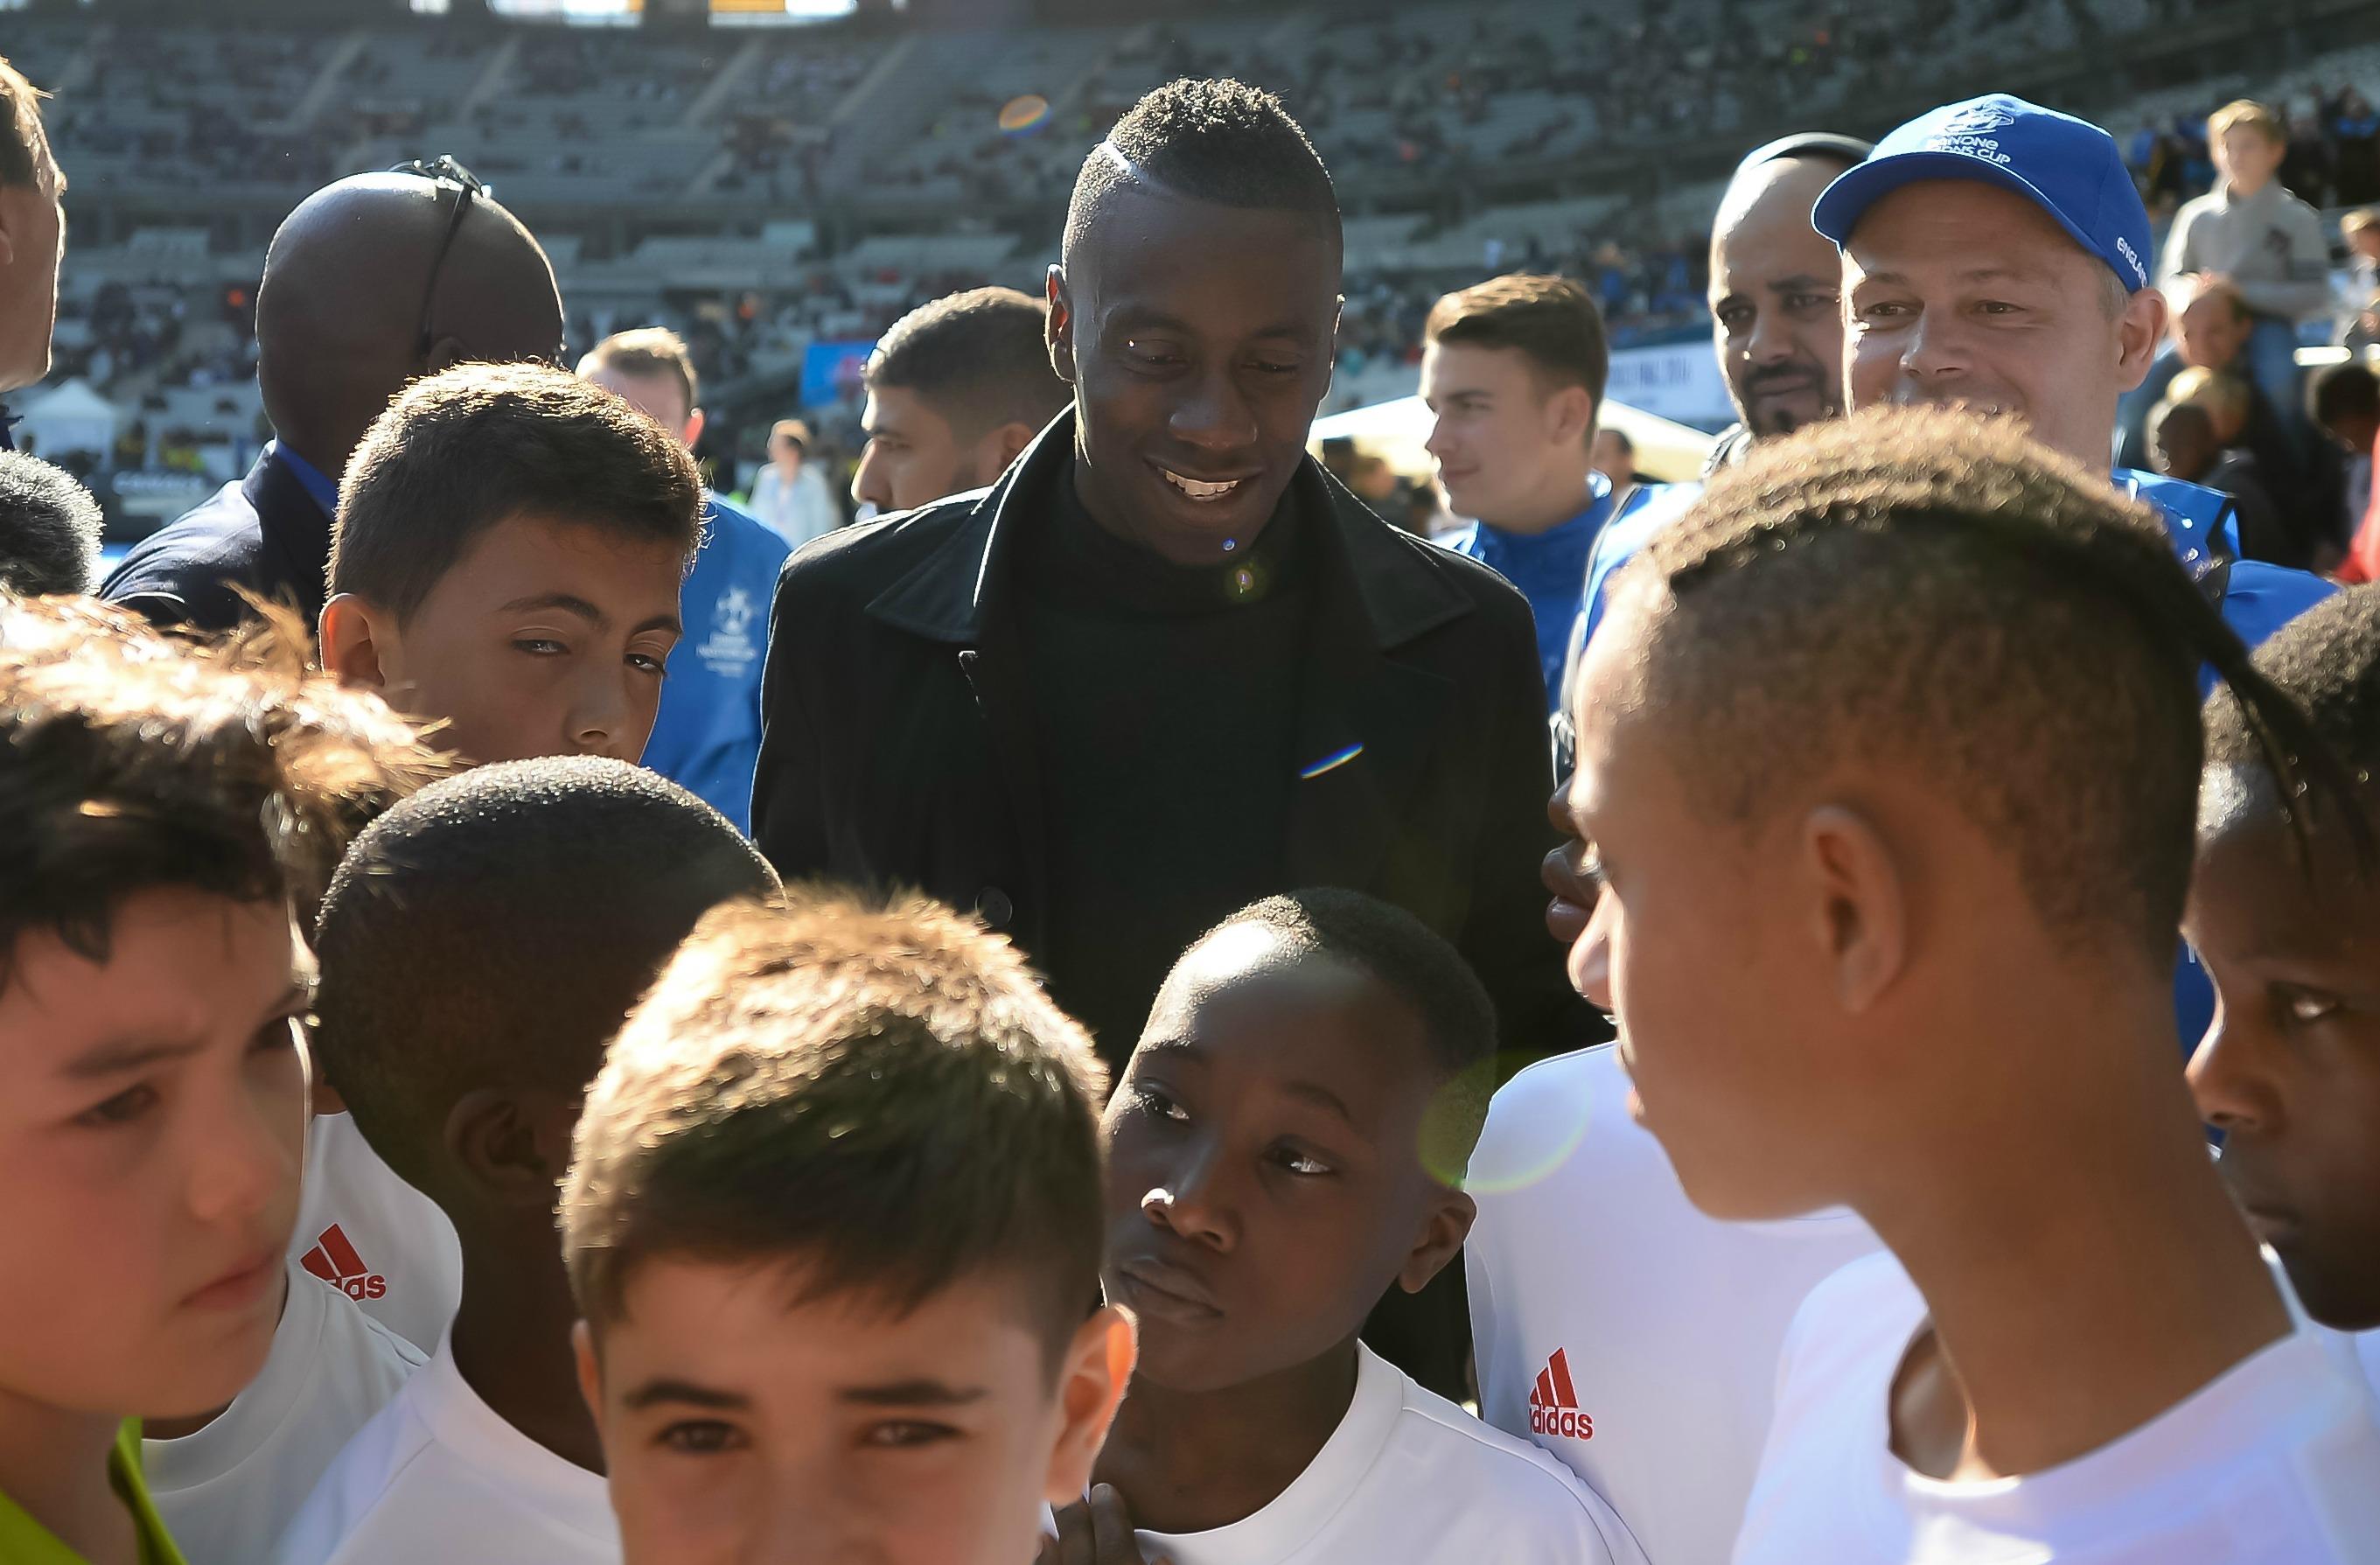 Exclusive: Manchester United target Blaise Matuidi open to Premier League transfer move